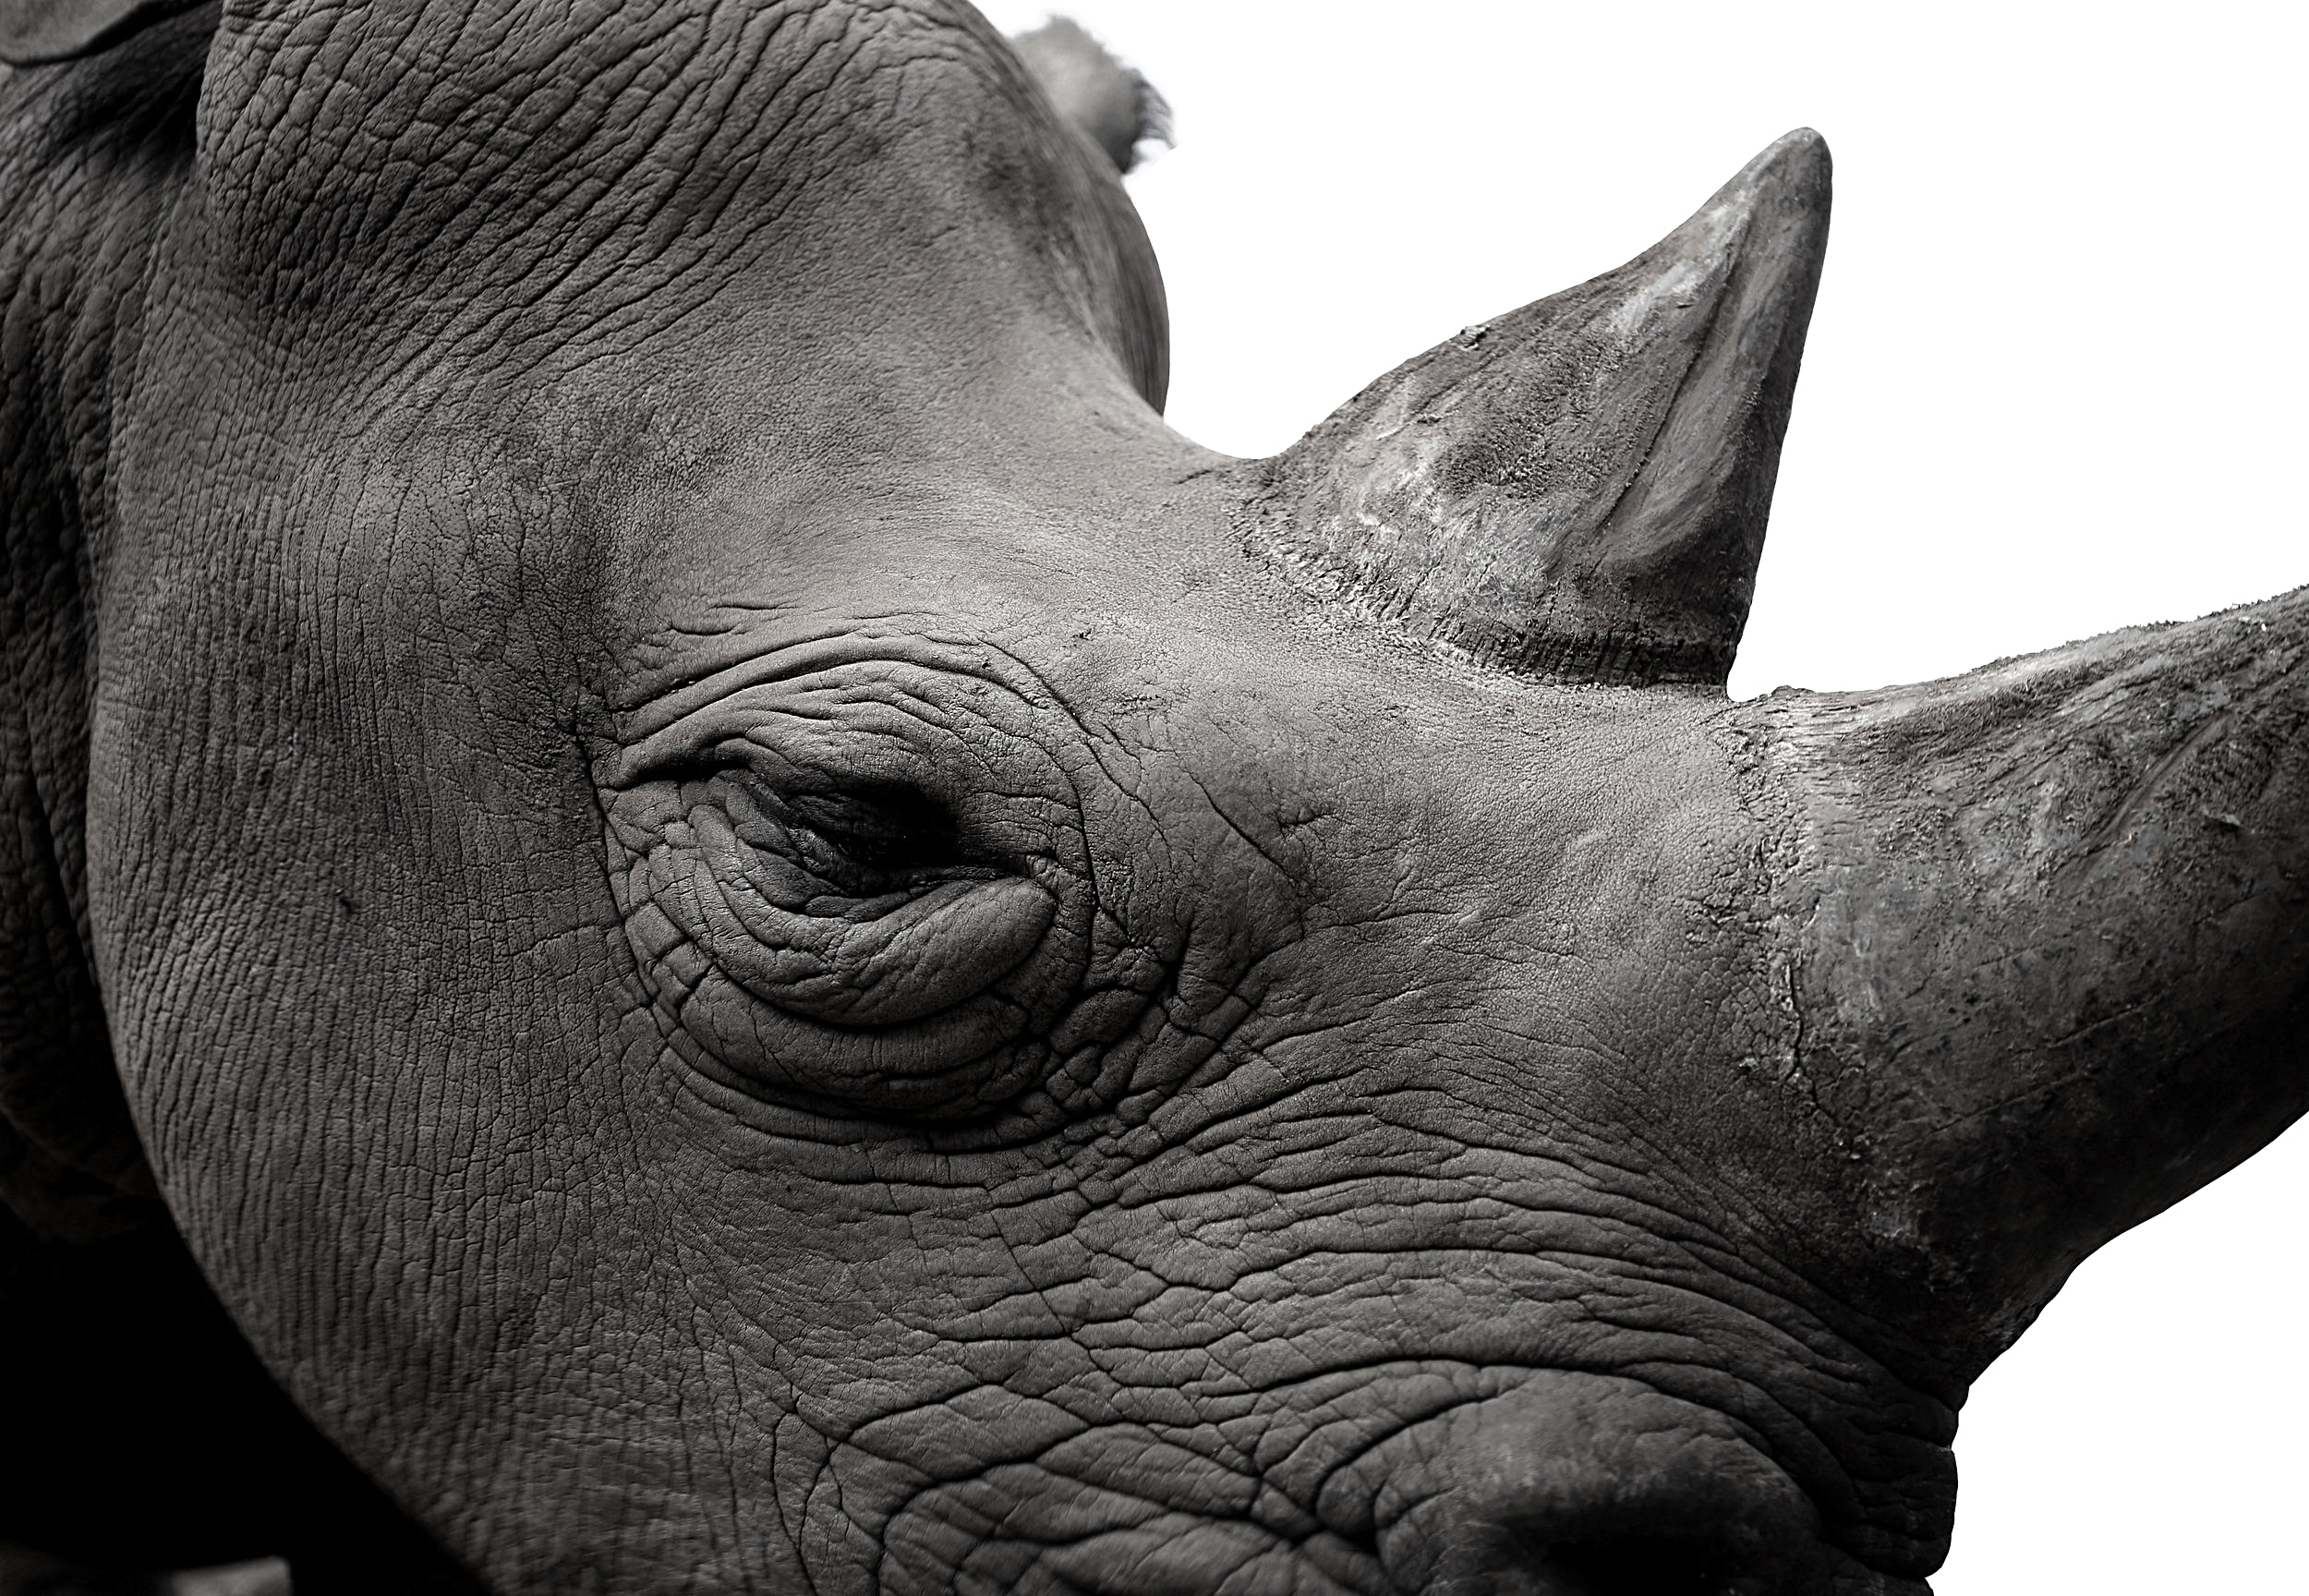 Photograph by Kirsten Brophy, 2017 Nairobi National Park